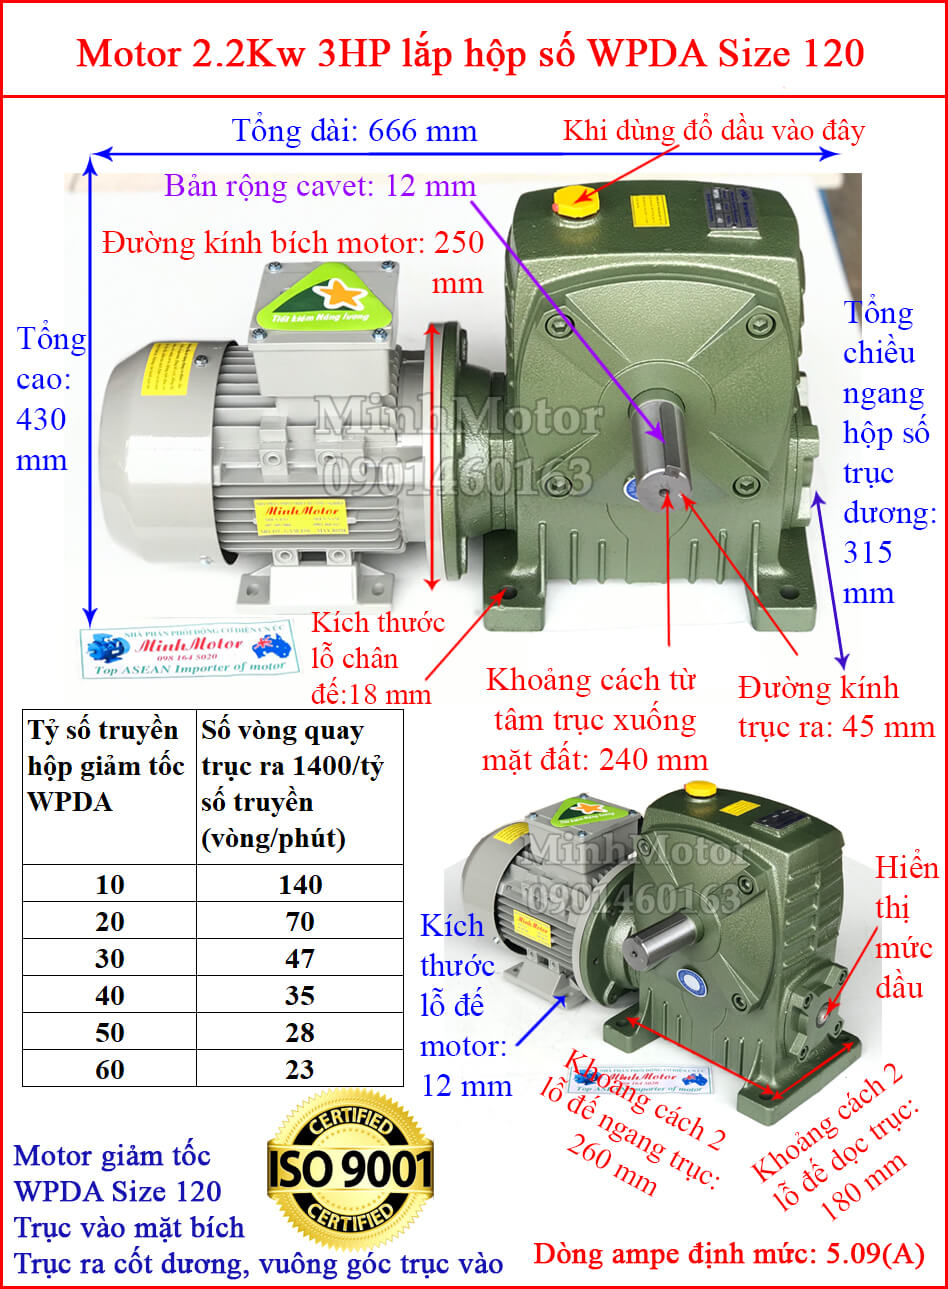 Hộp số WPDA size 120 liền motor